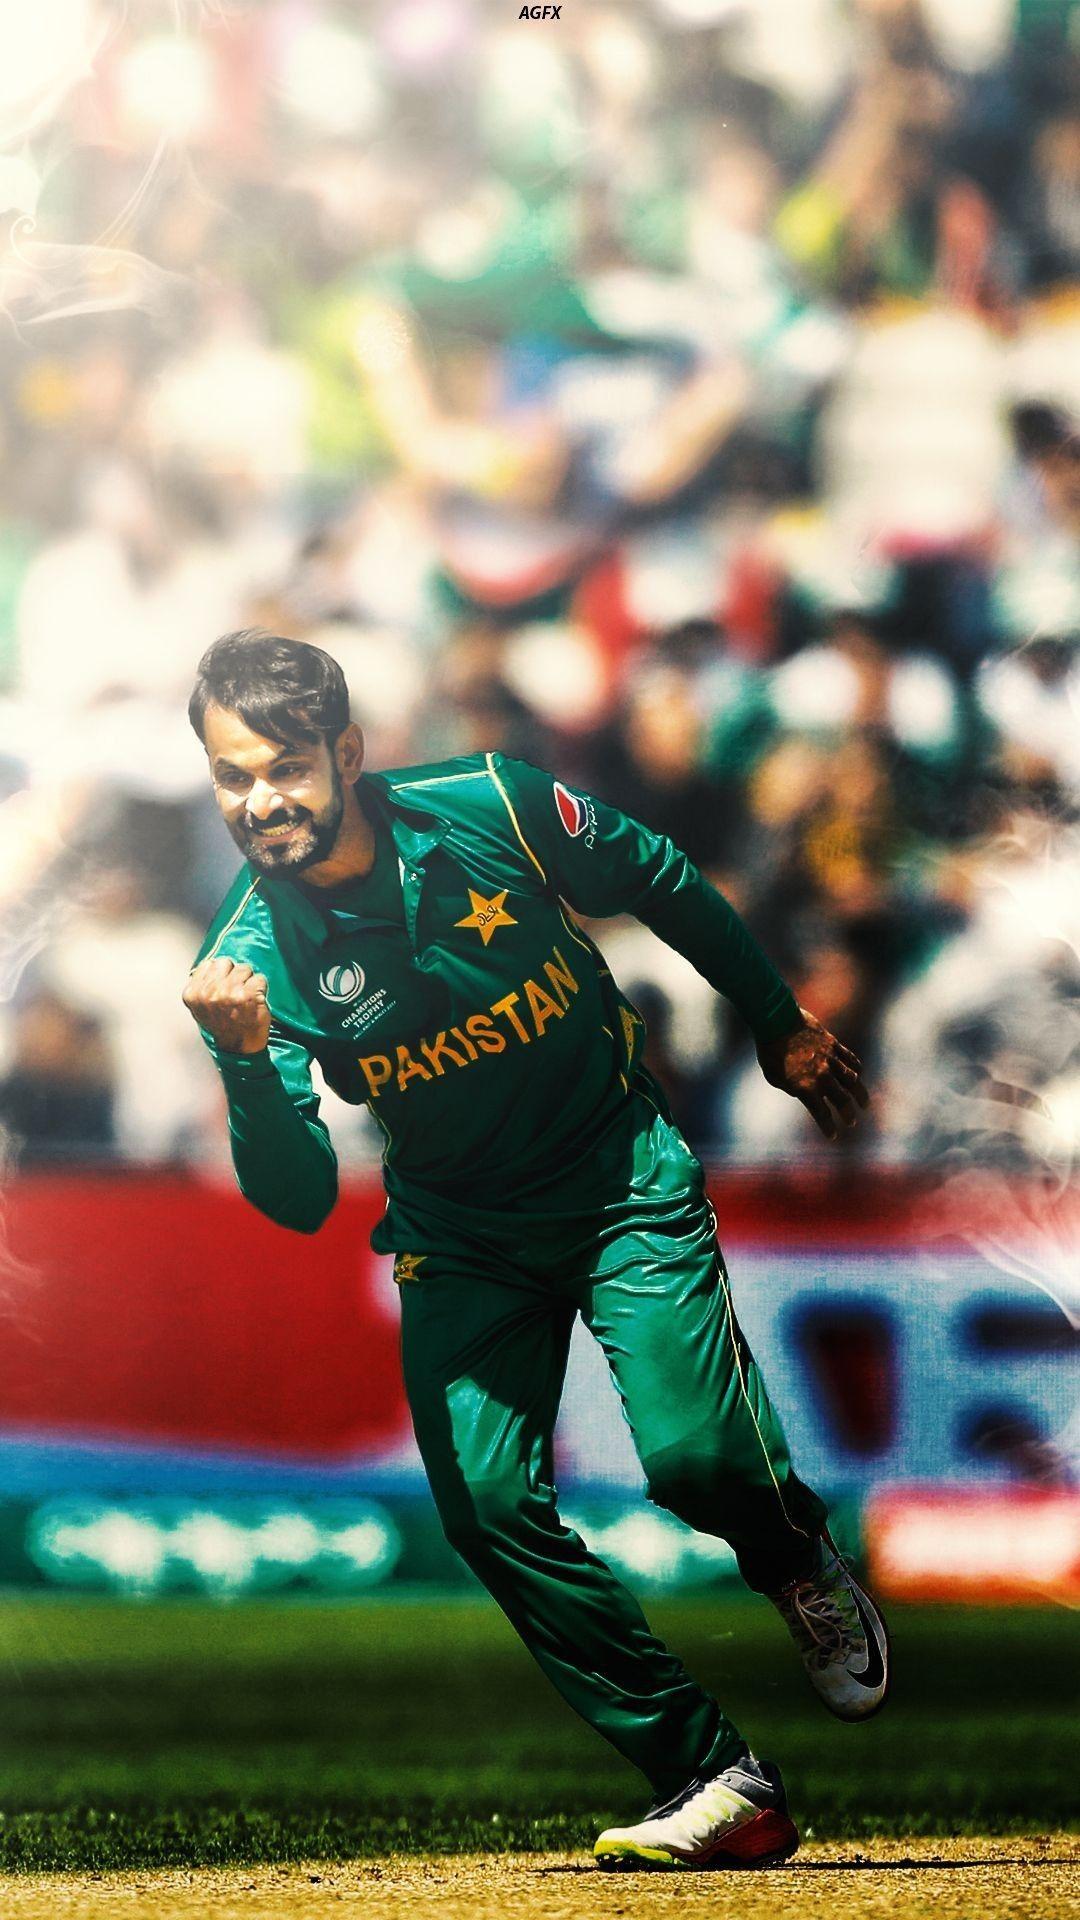 Pin By Khadija Baloch On Pakistan Cricket Cricket Streaming World Cricket Live Matches